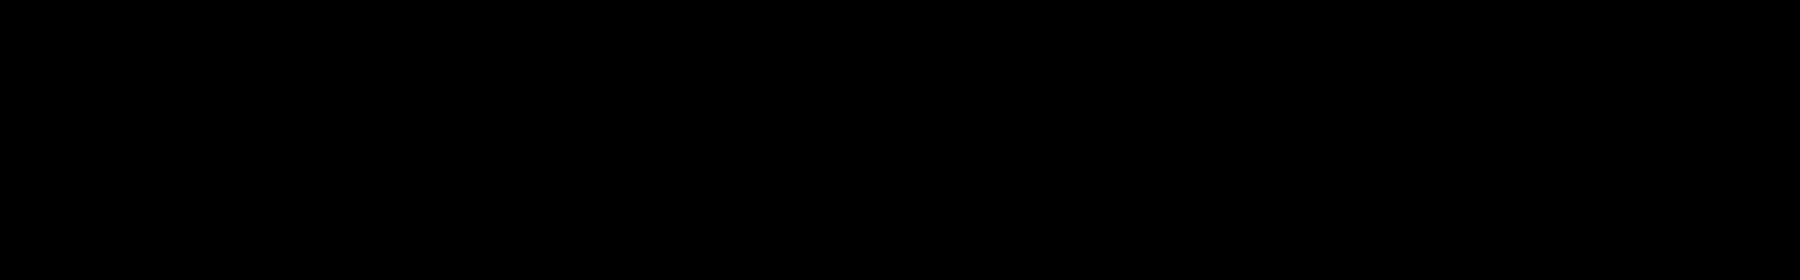 THE CADENCE audio waveform